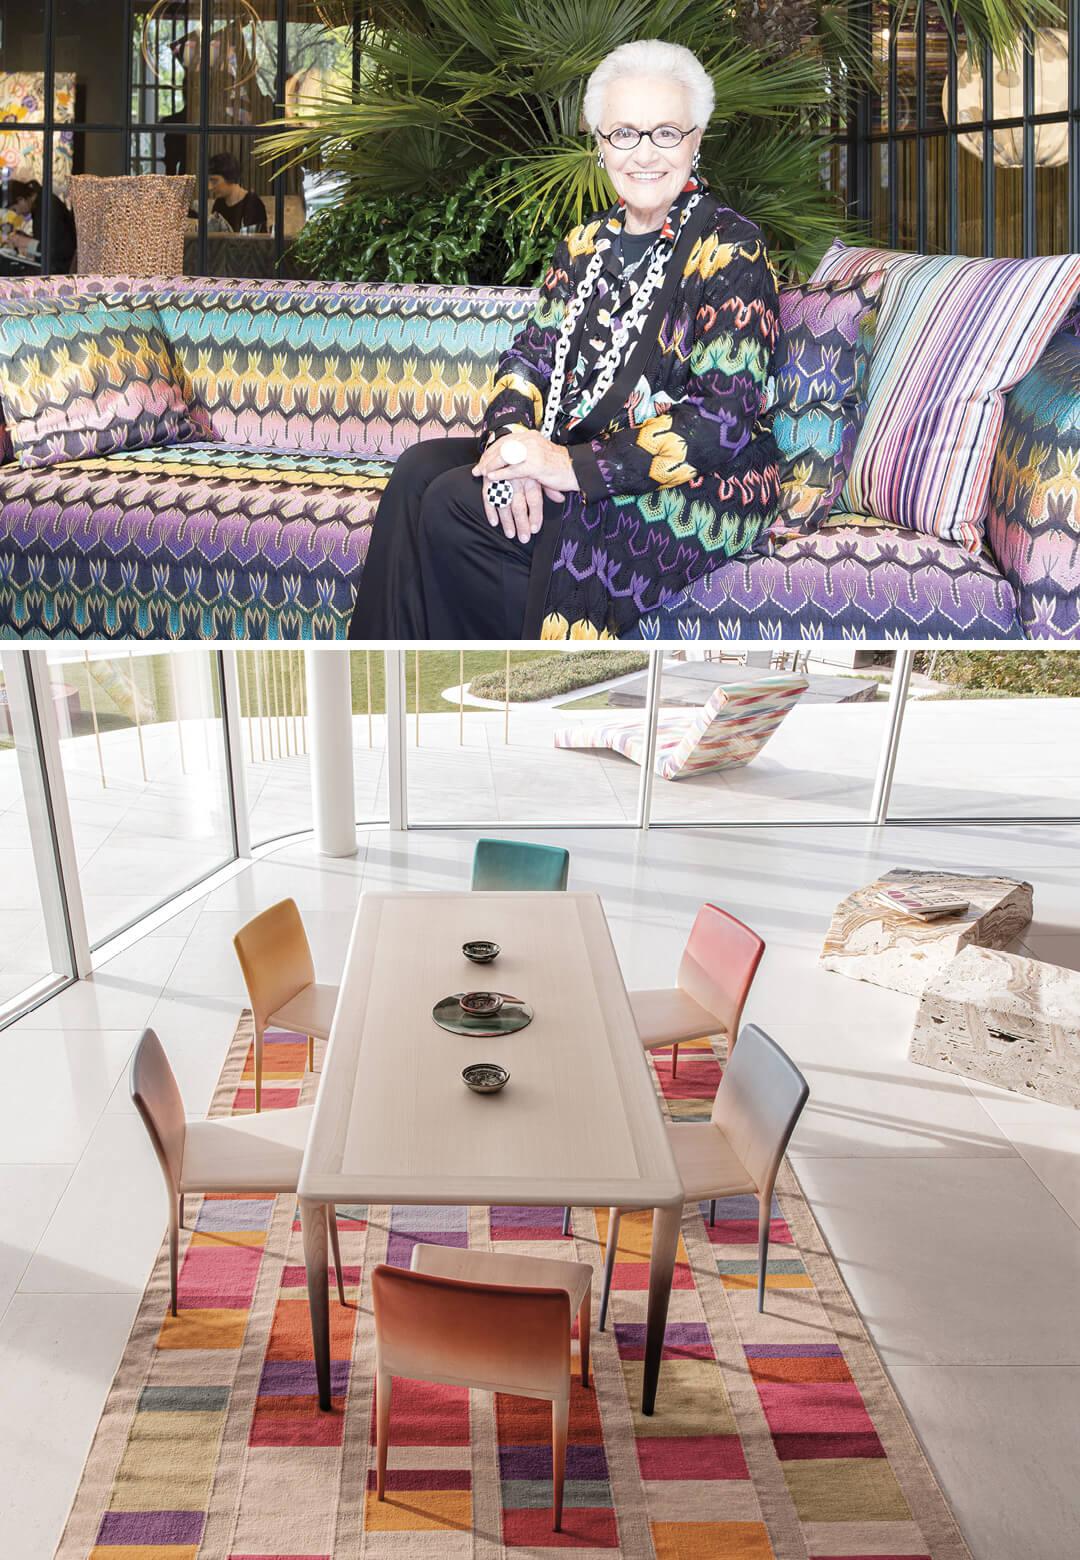 Rosita Missoni, acclaimed fashion designer and proprietor and co-founder of Italian luxury fashion brand Missoni speaks about MissoniHome 2021 collection| Missoni Home 2021: Interview with Rosita Missoni | STIRworld